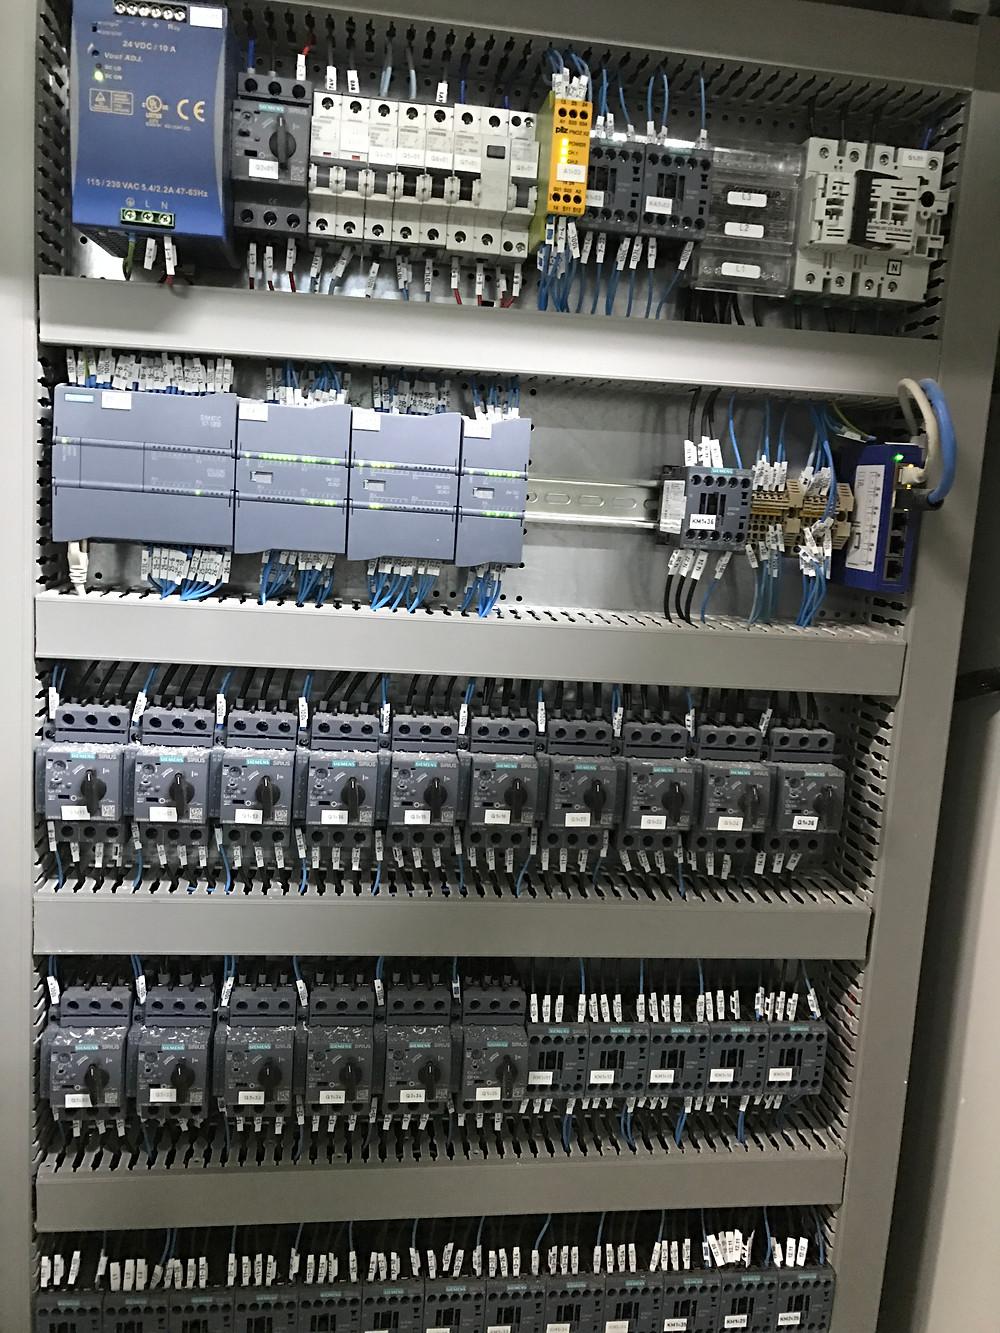 armoire automatisme s7-1200